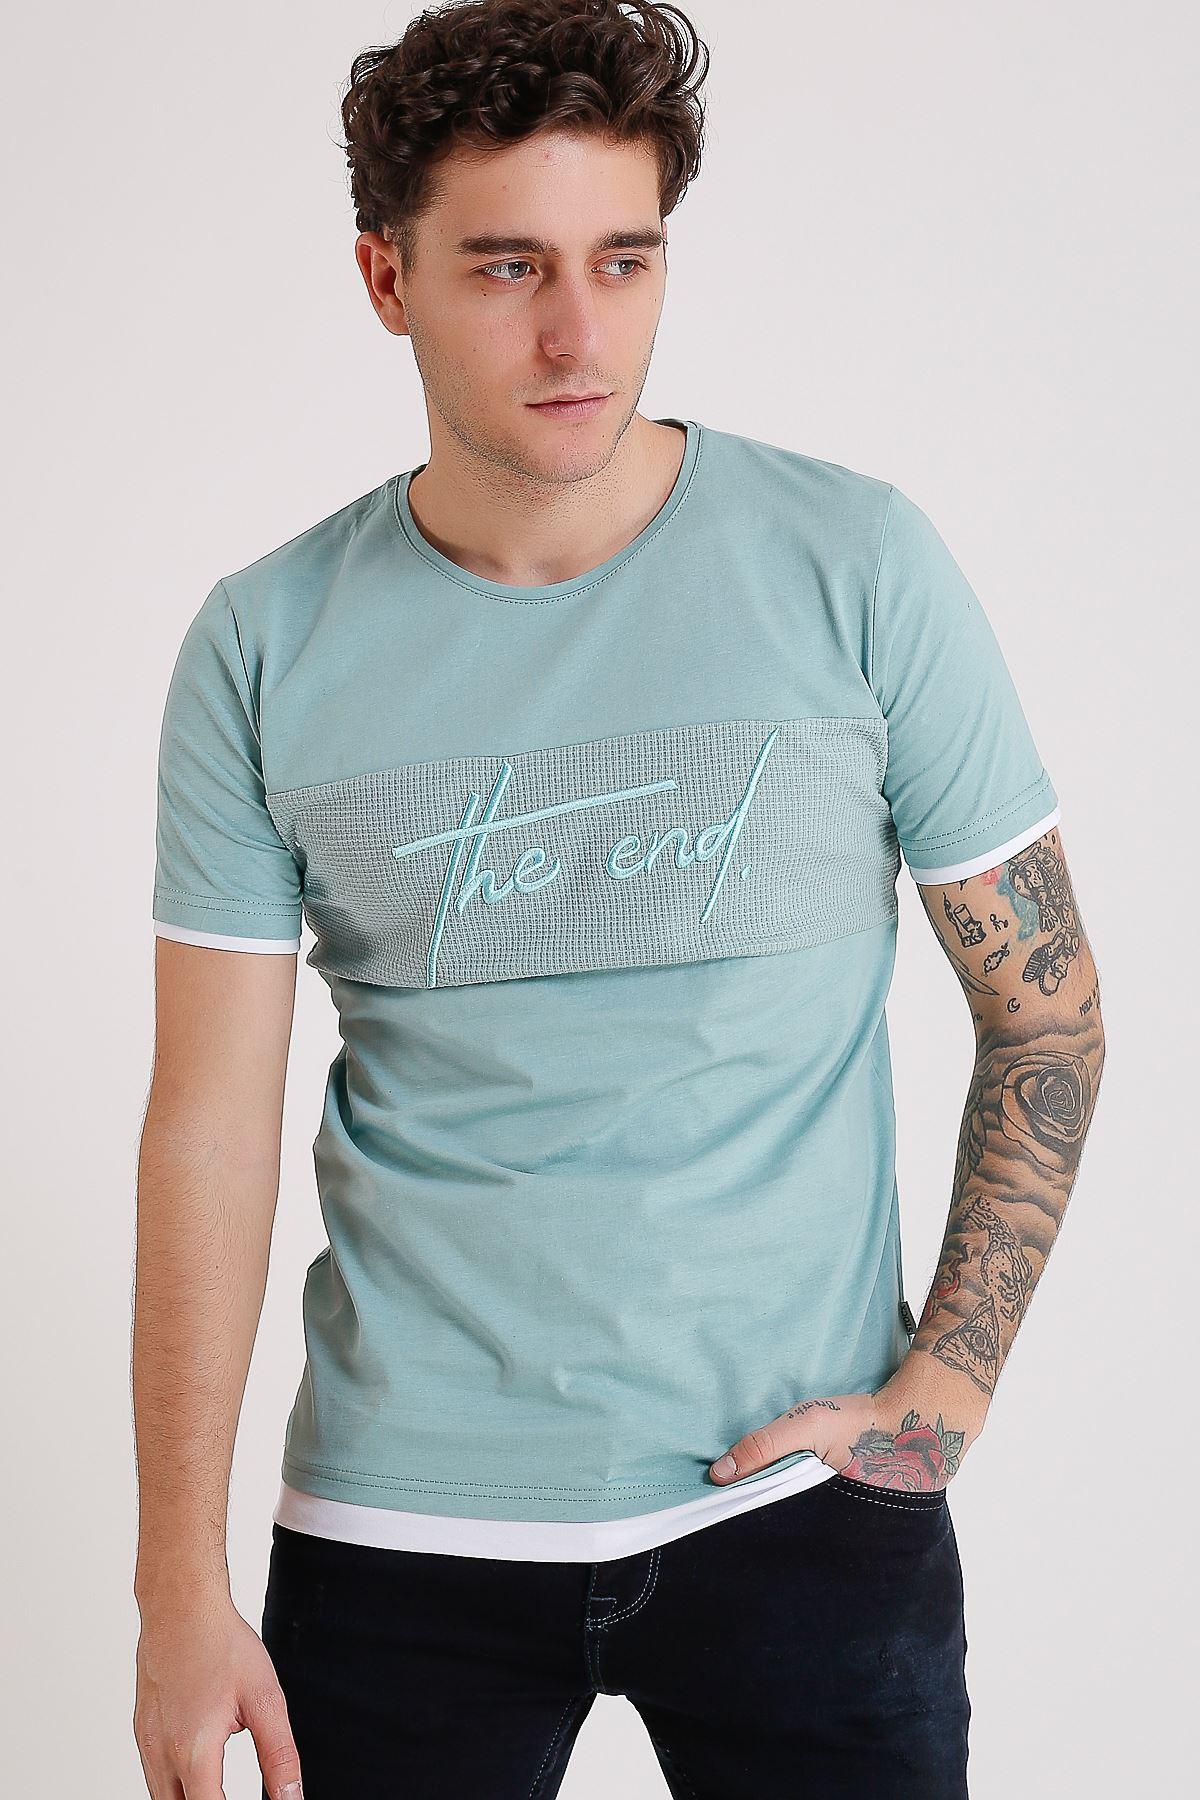 Bisiklet Yaka Nakışlı Mint Erkek Penye T-Shirt